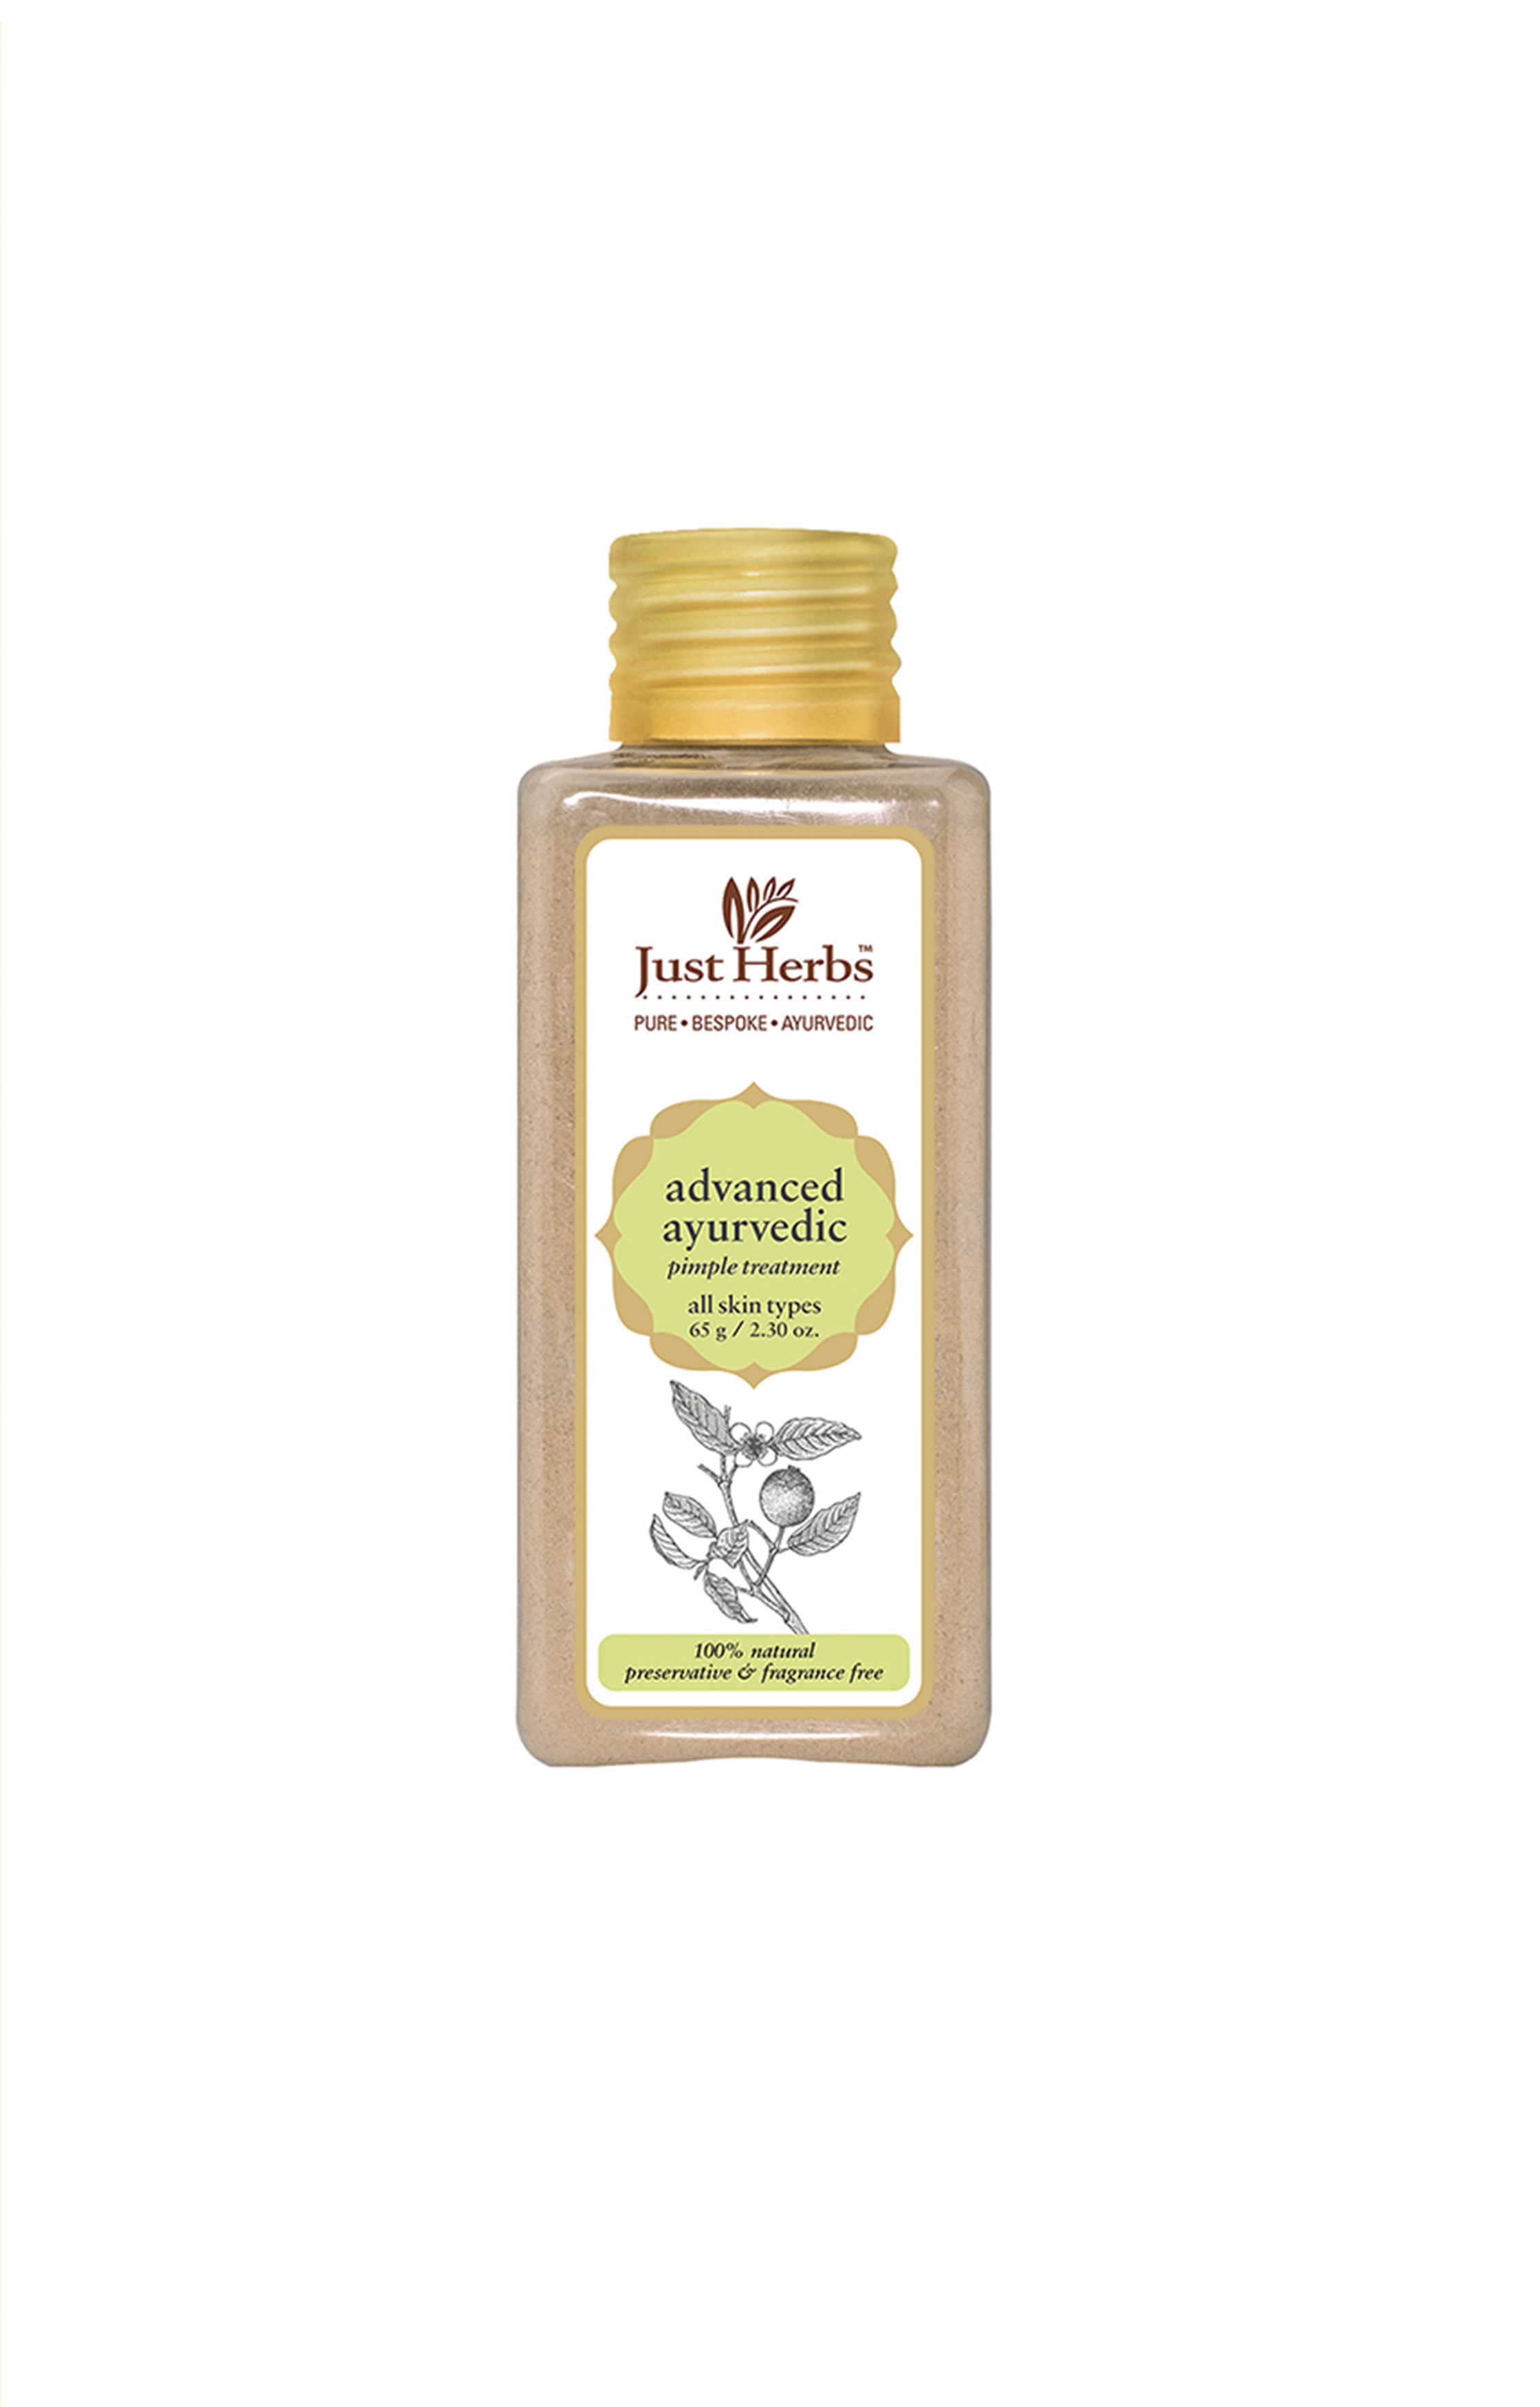 Just Herbs | Advanced Ayurvedic Pimple Treatment